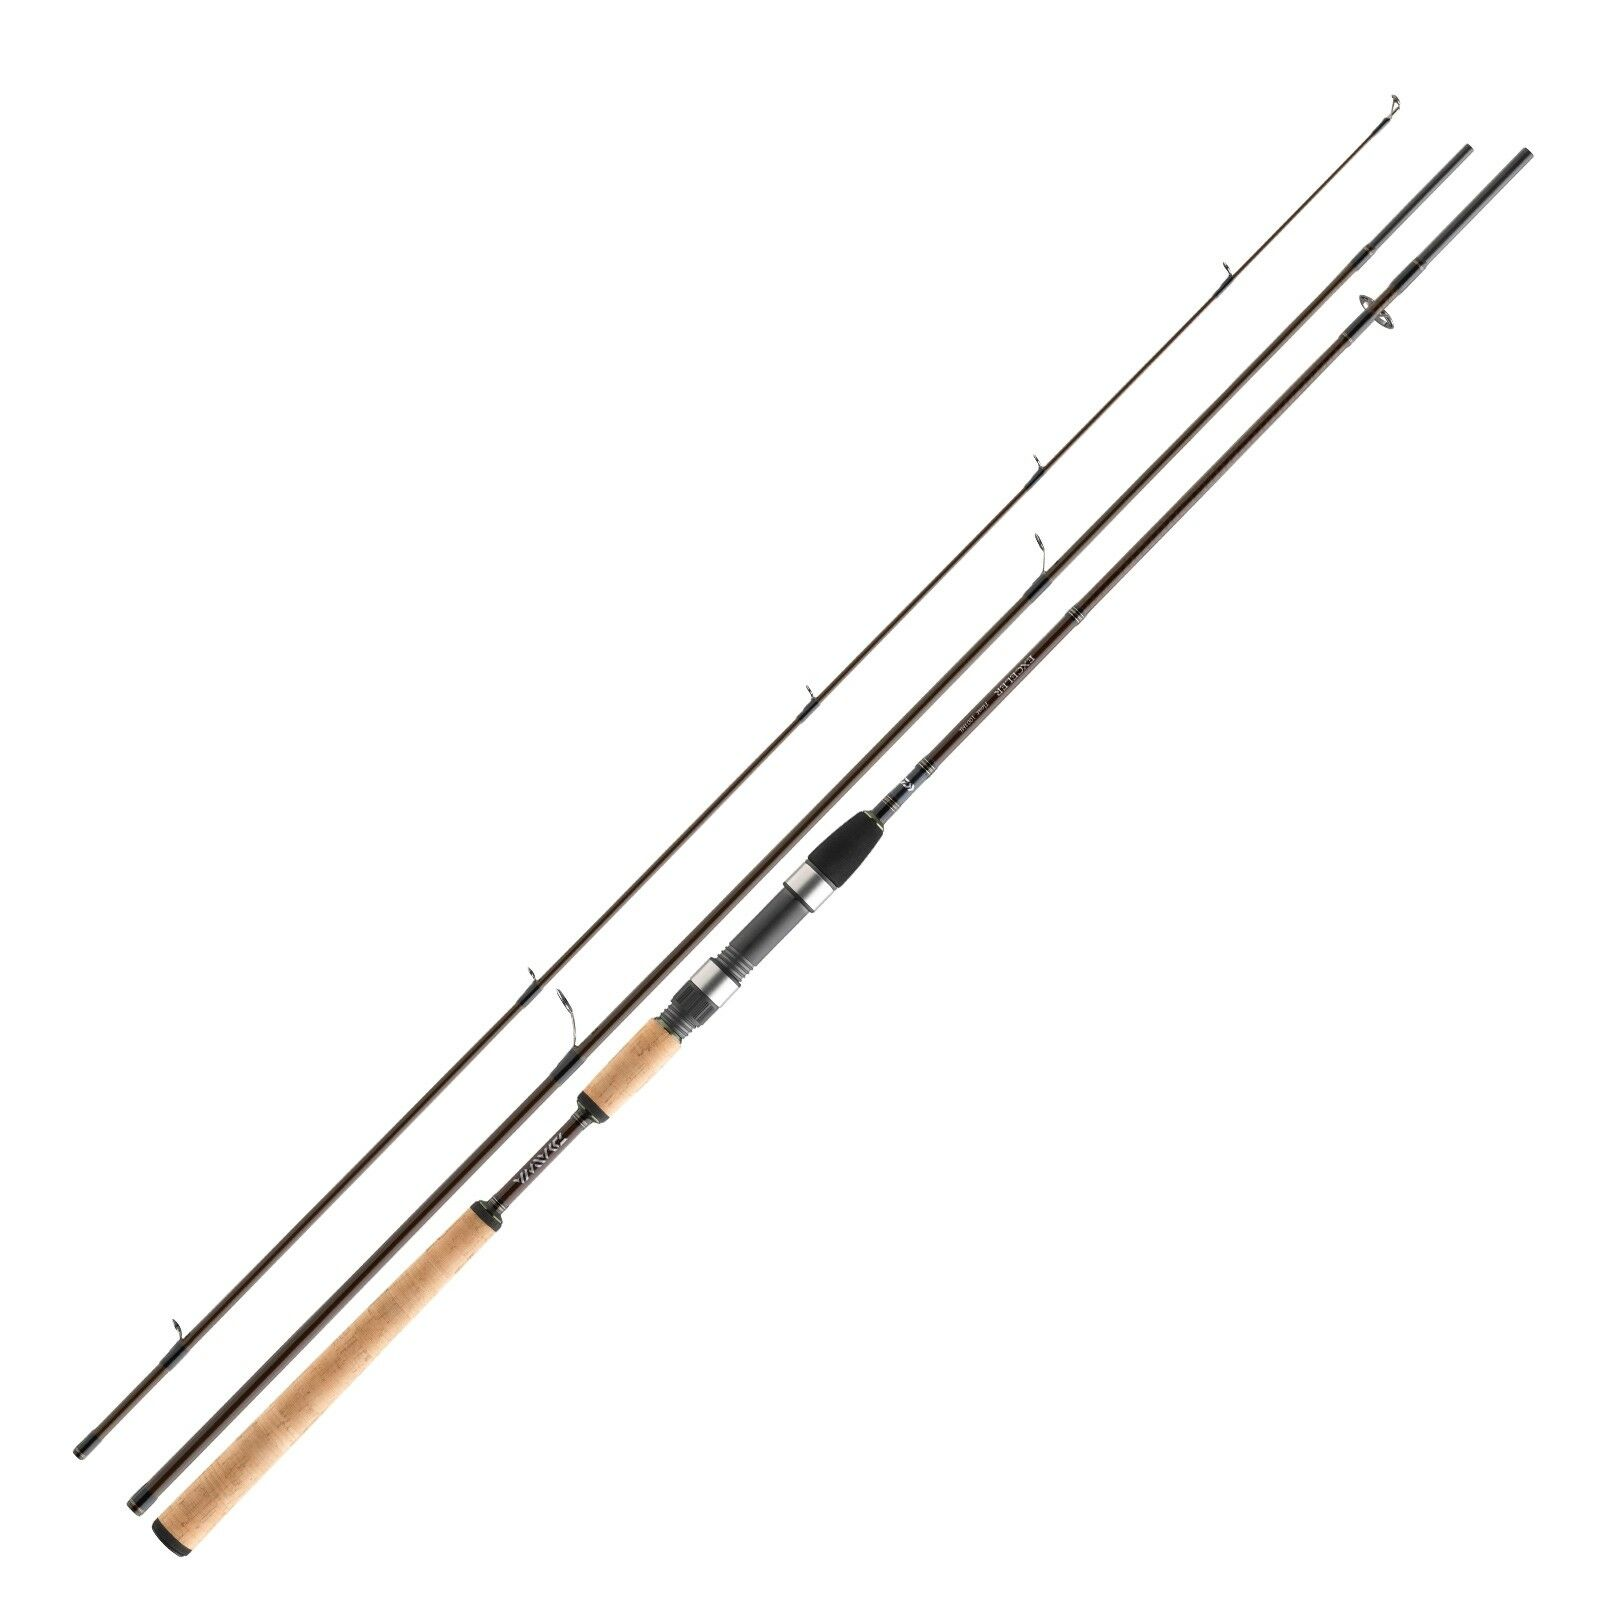 Daiwa posenrute-exceler float 3,30m  10-30g 3 piezas  sin mínimo